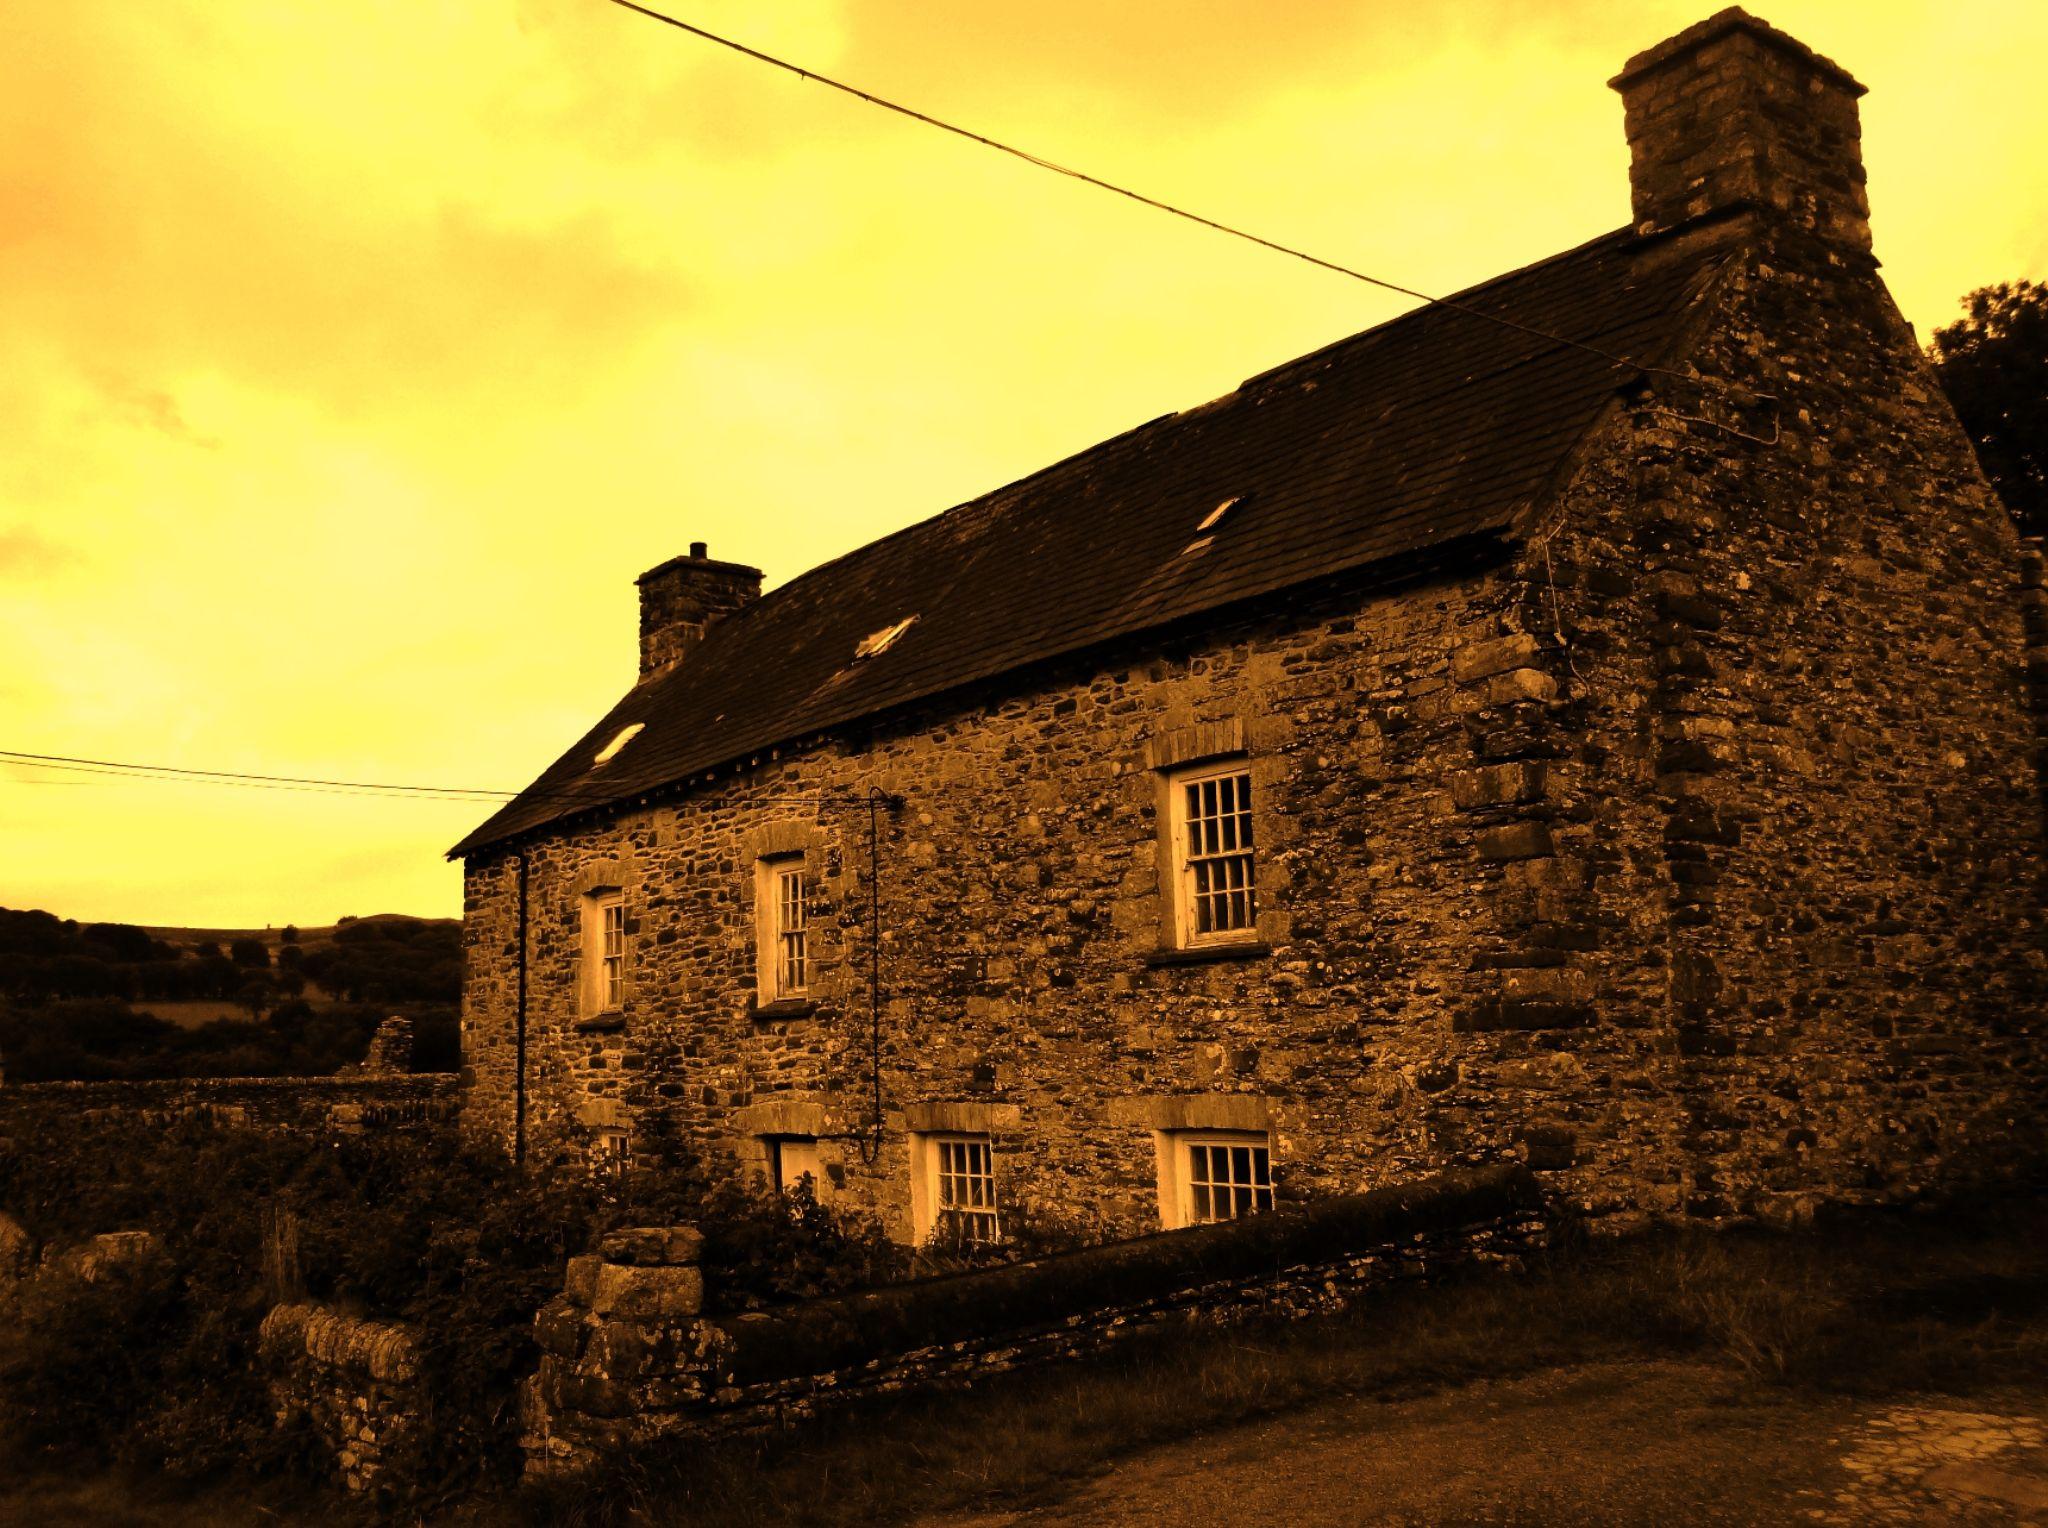 welsh farmhouse by chris.adams.3557